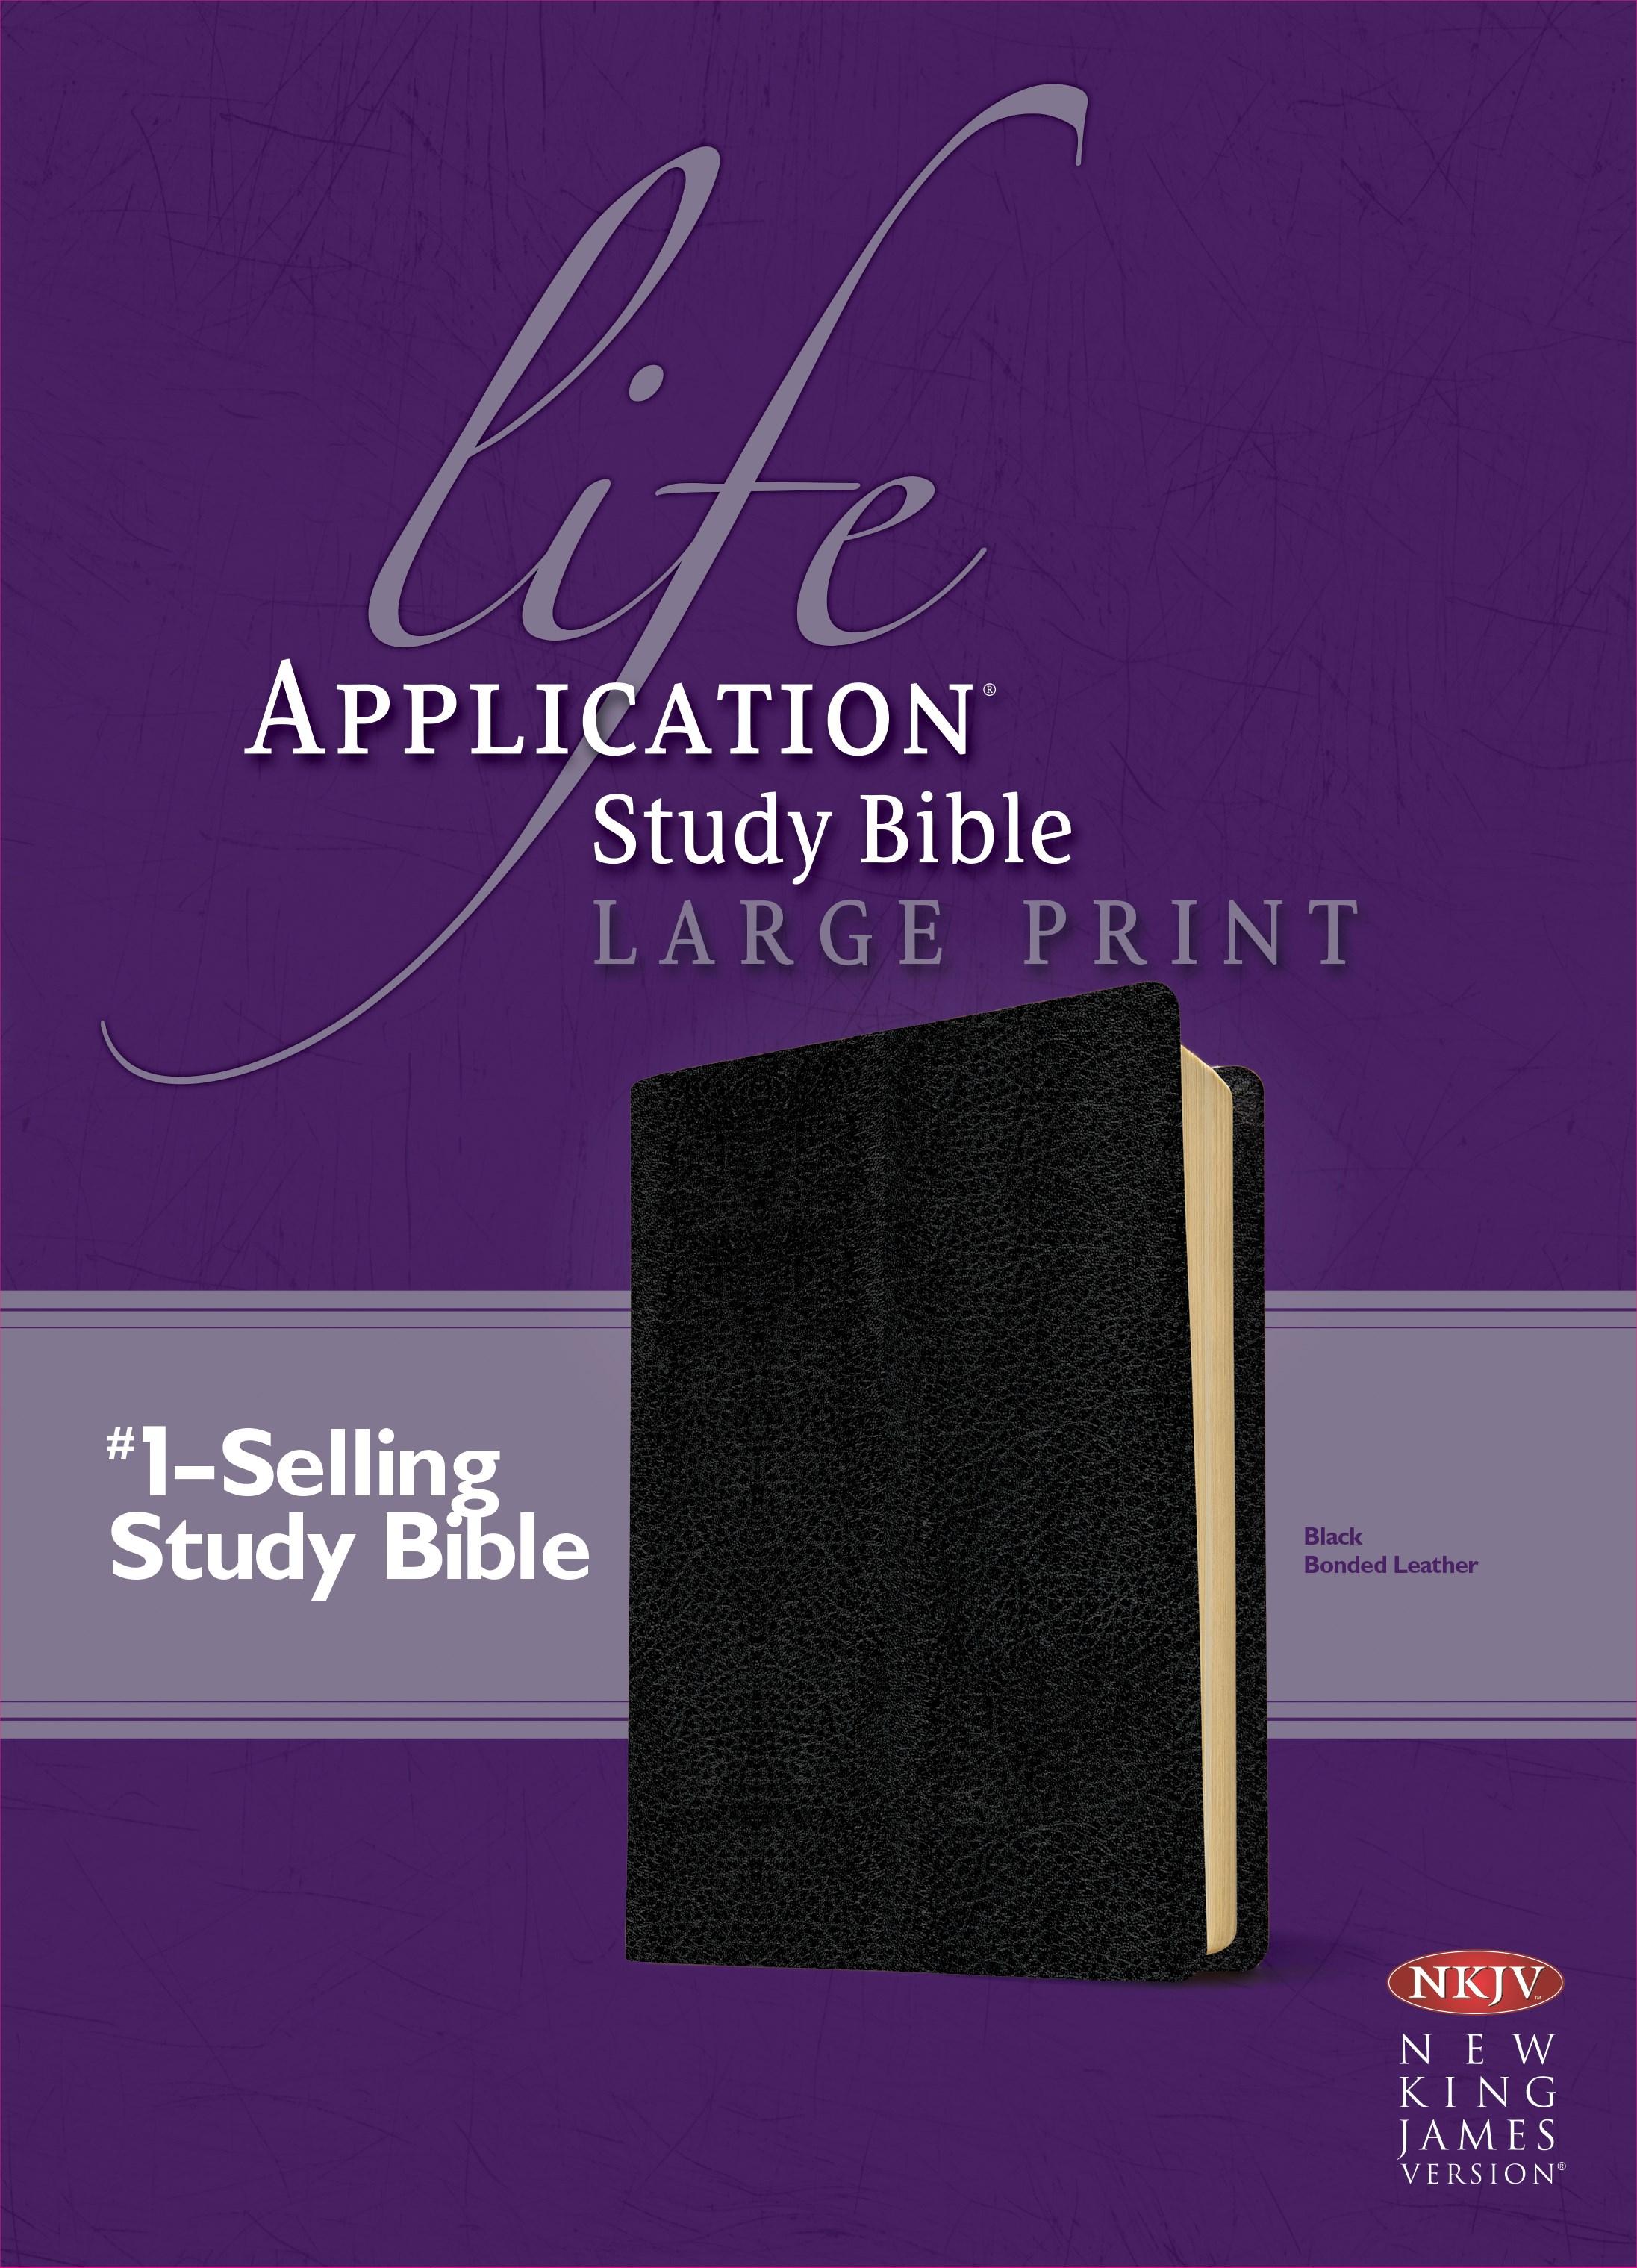 NKJV Life Application Study Bible/Large Print-Black Bonded Leather